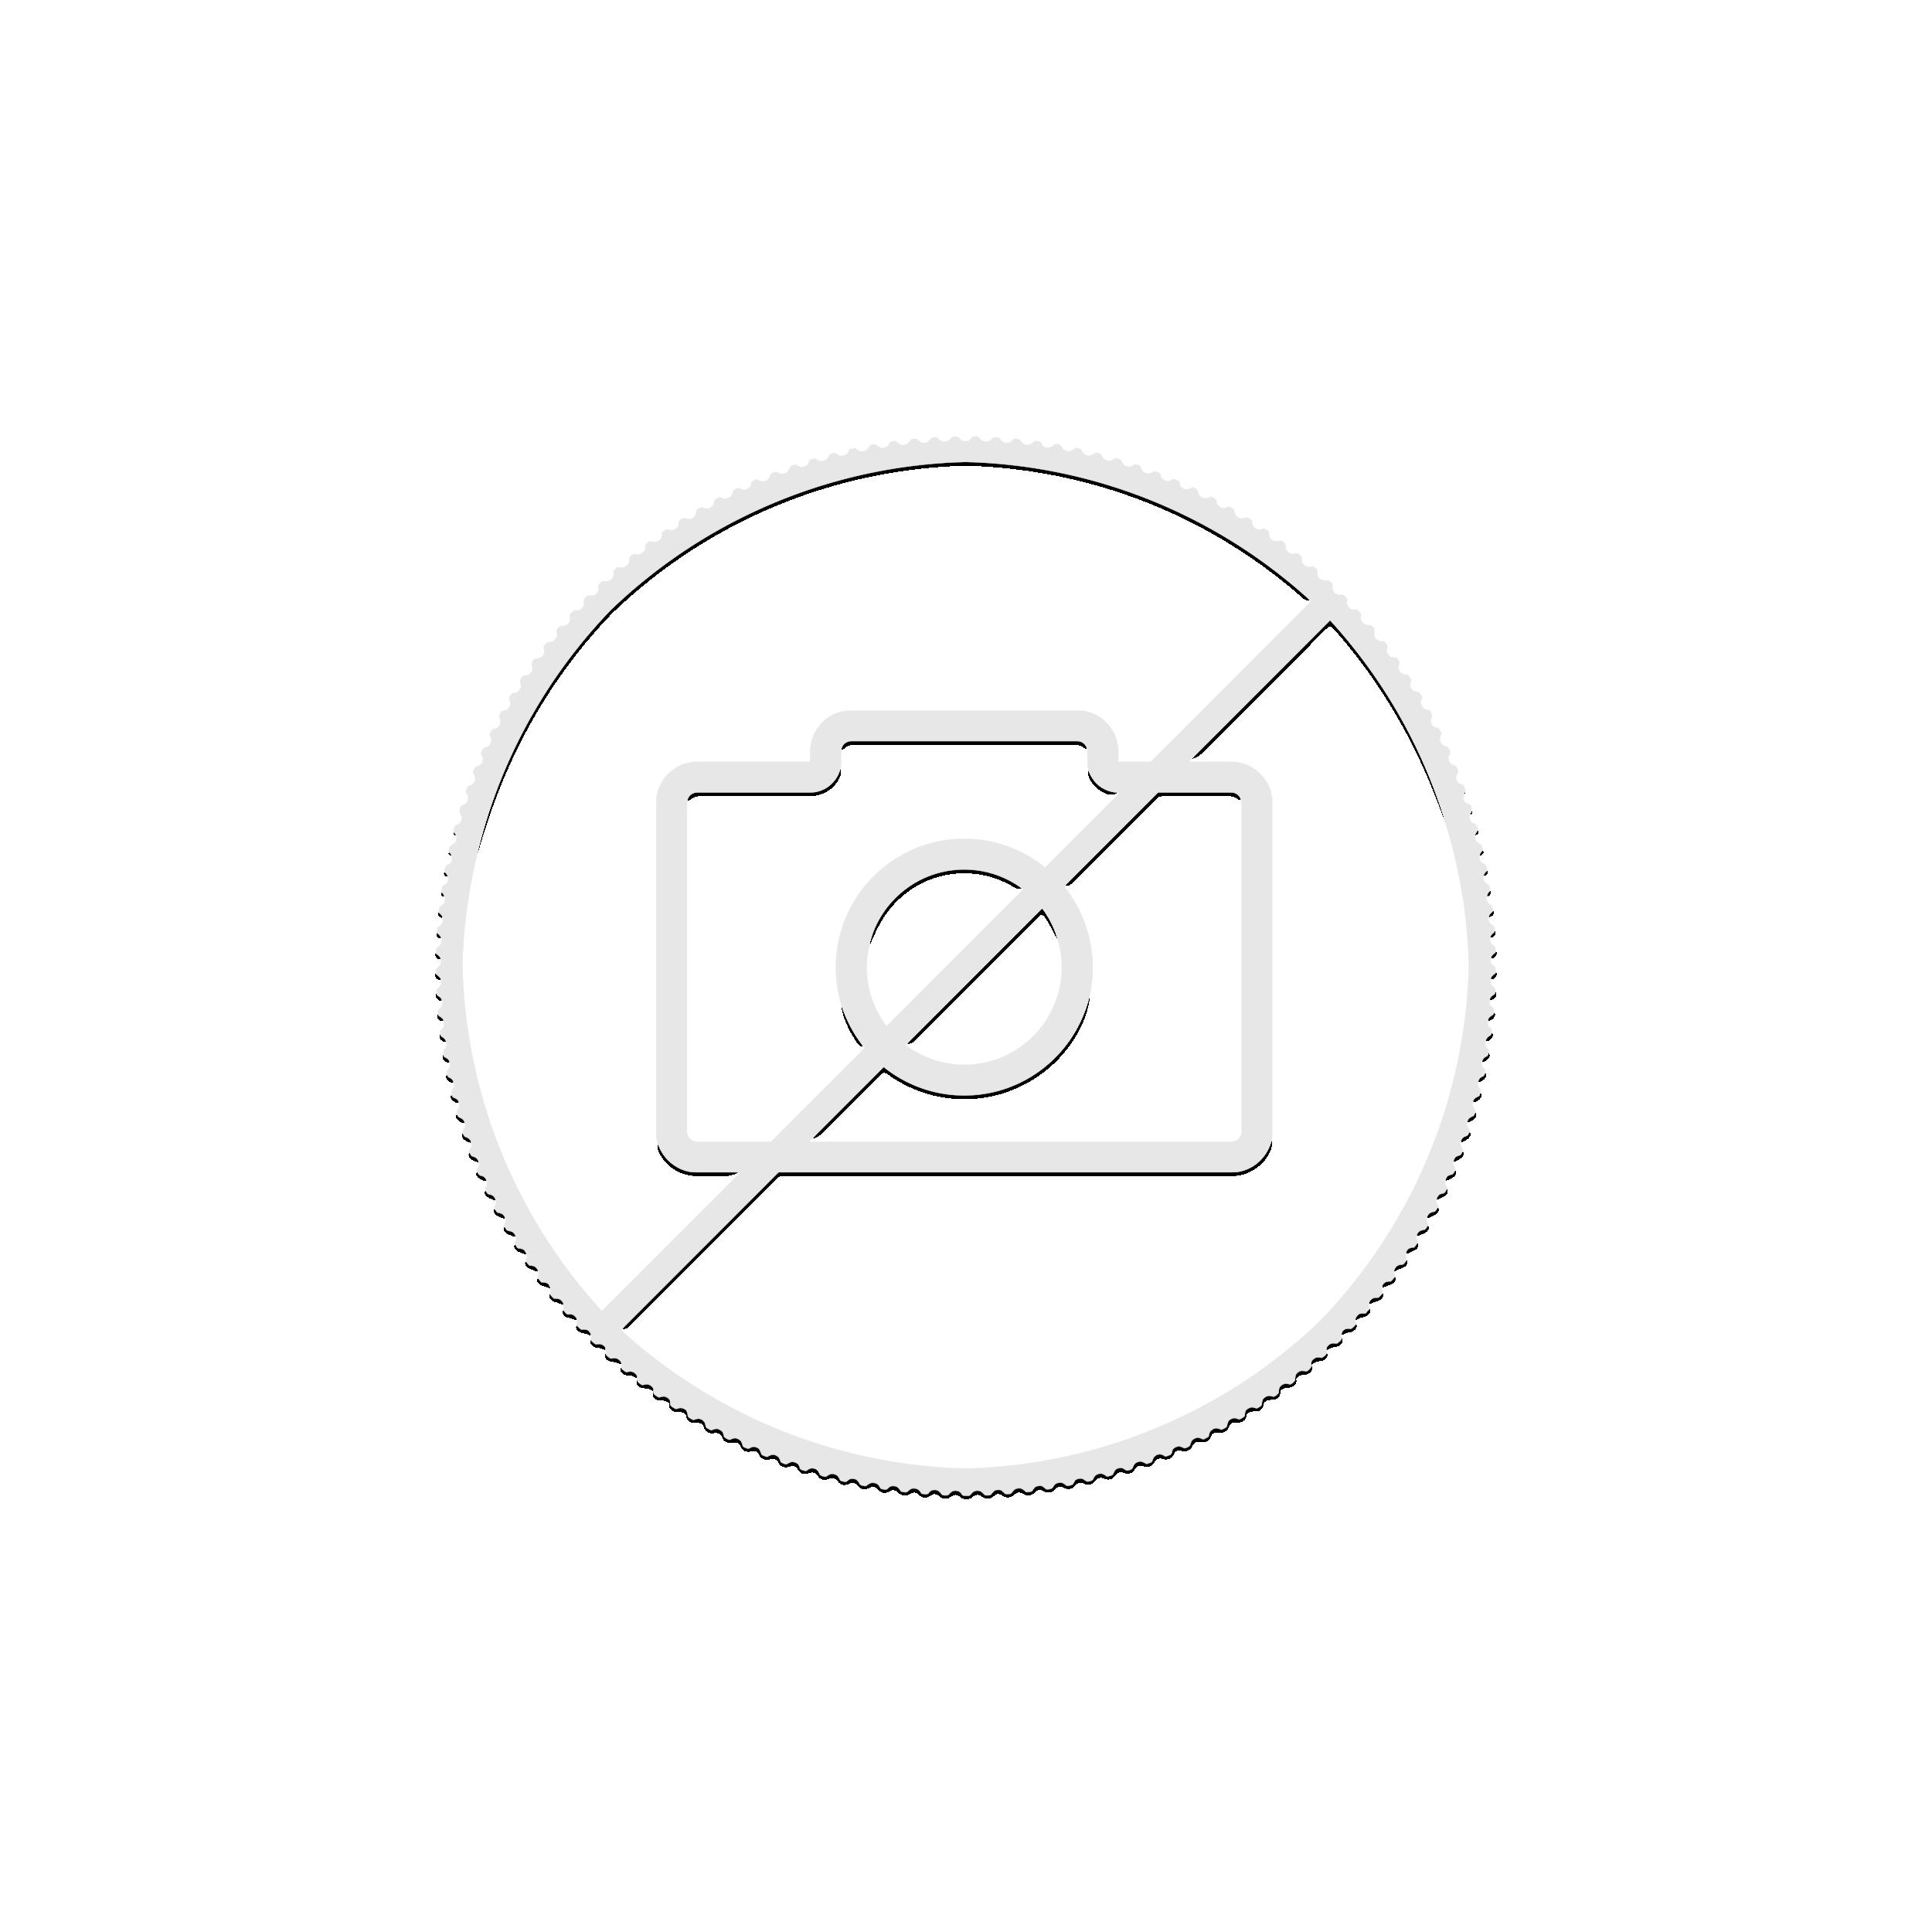 Doos van 10 stuks muntcapsule 33 mm Intercept